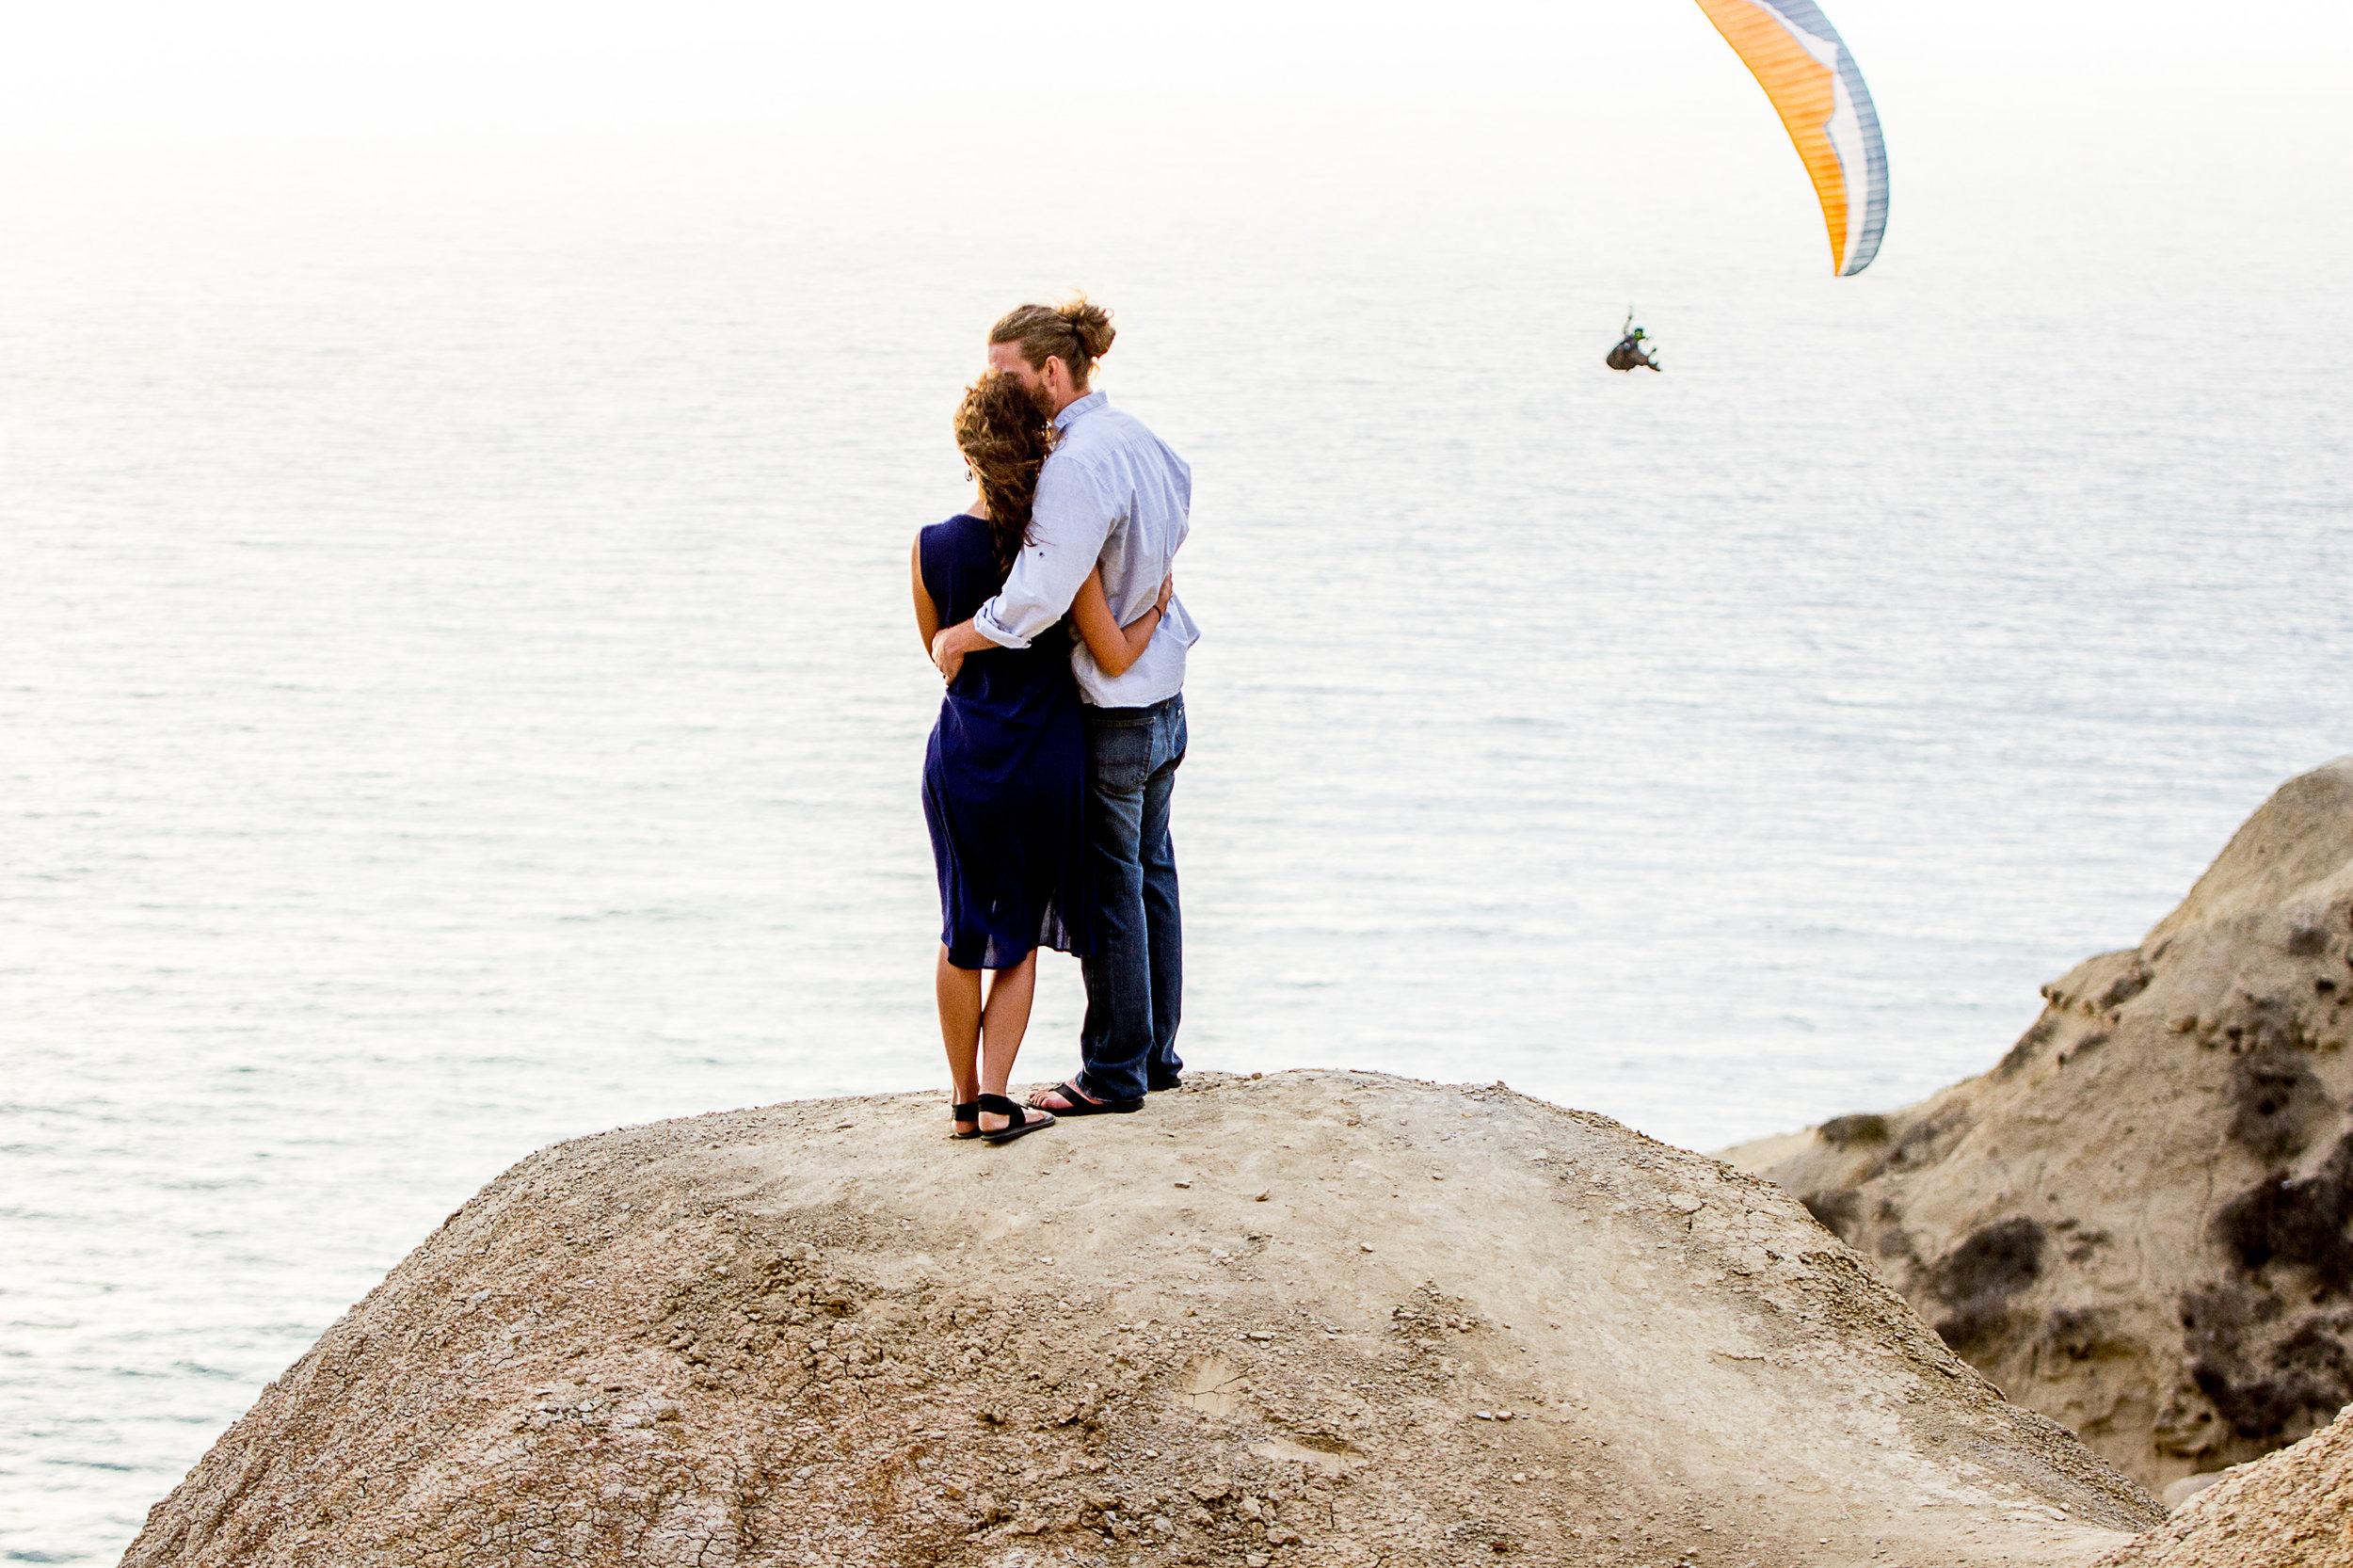 la-jolla-glider-point-torrey-pines-anniversary-session-true-loves-kiss-san-diego-photographer-sophia-elizabeth (118 of 181).jpg